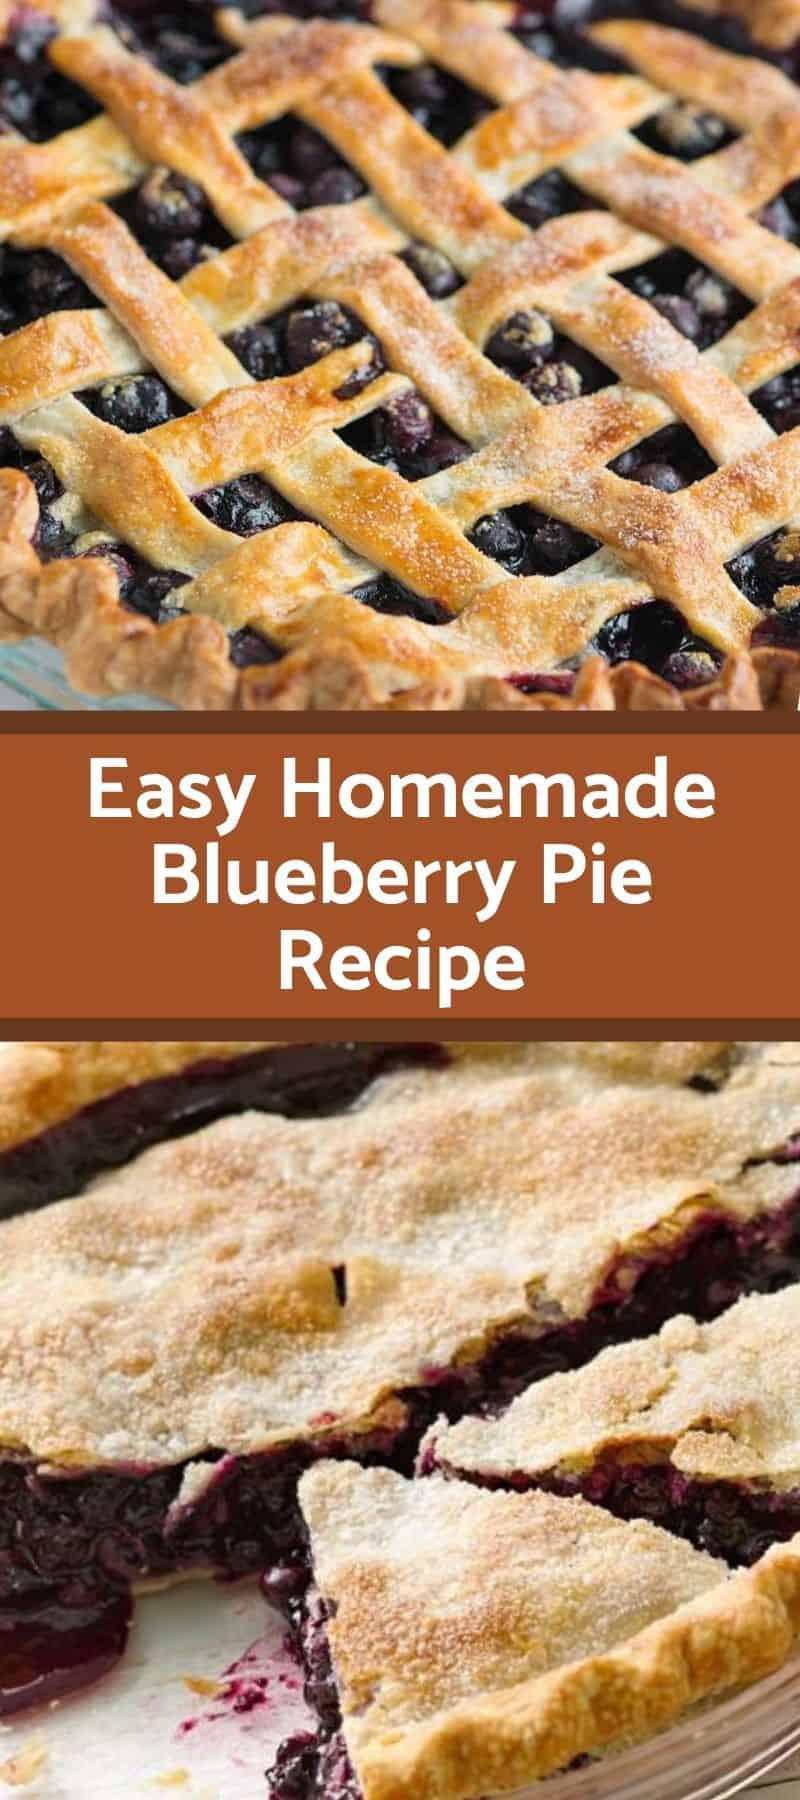 Easy Homemade Blueberry Pie Recipe 3